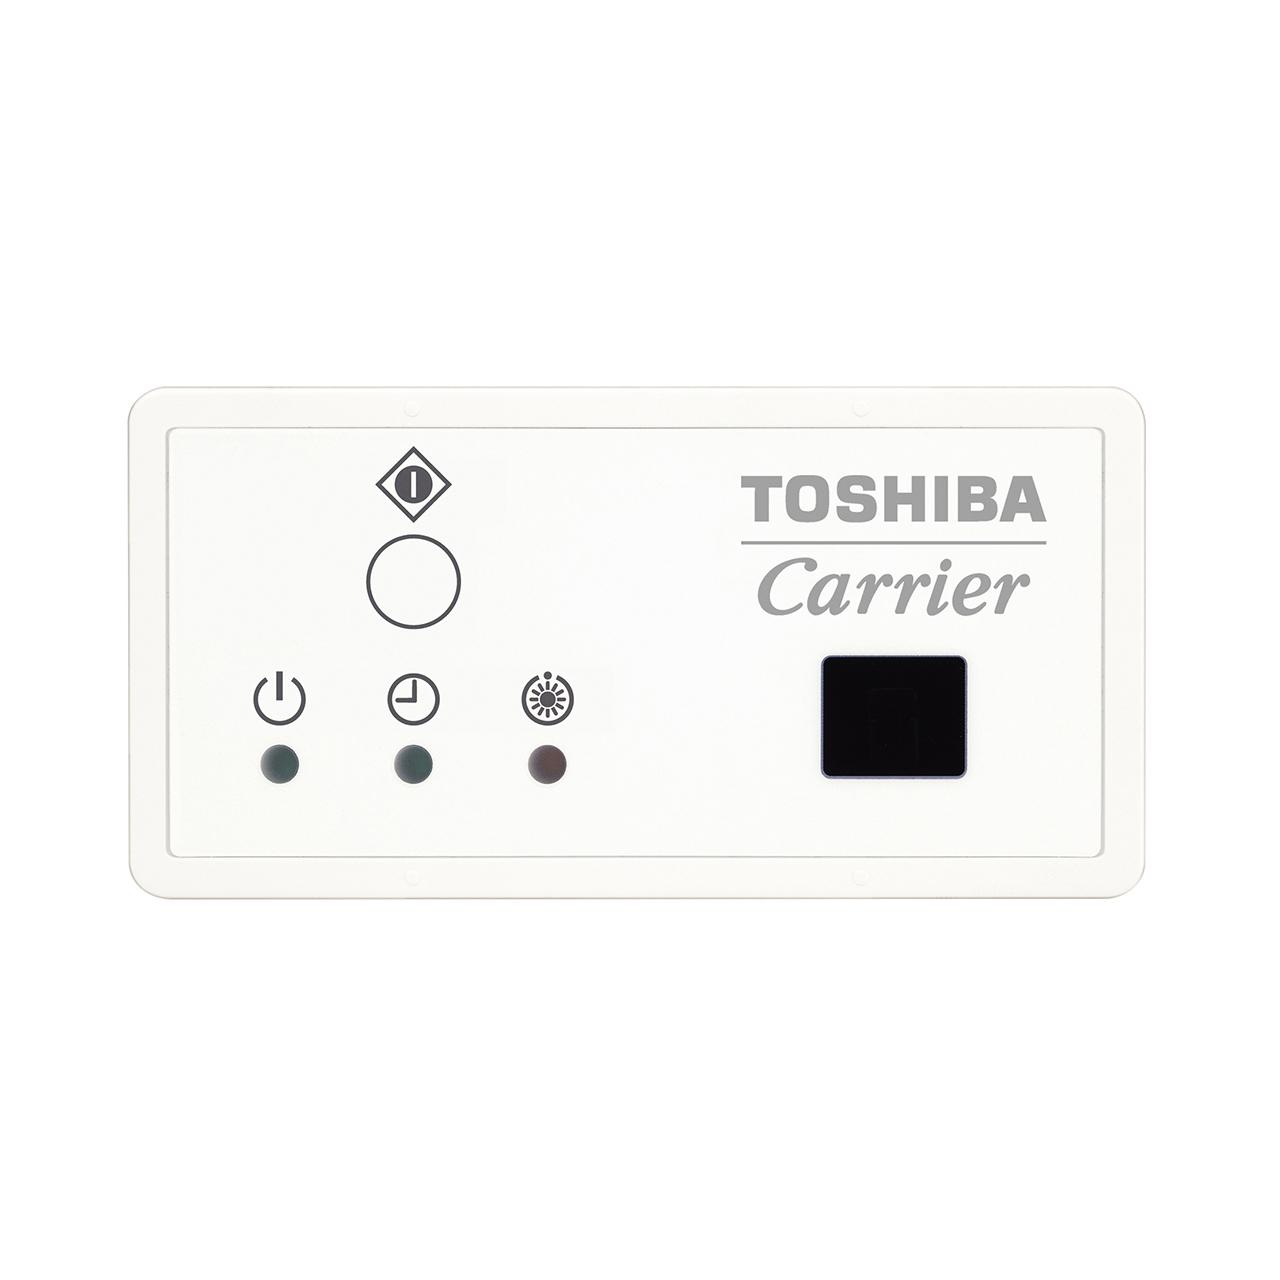 carrier-RBC-AX33CUL-vrf-integral-underceiling-receiver